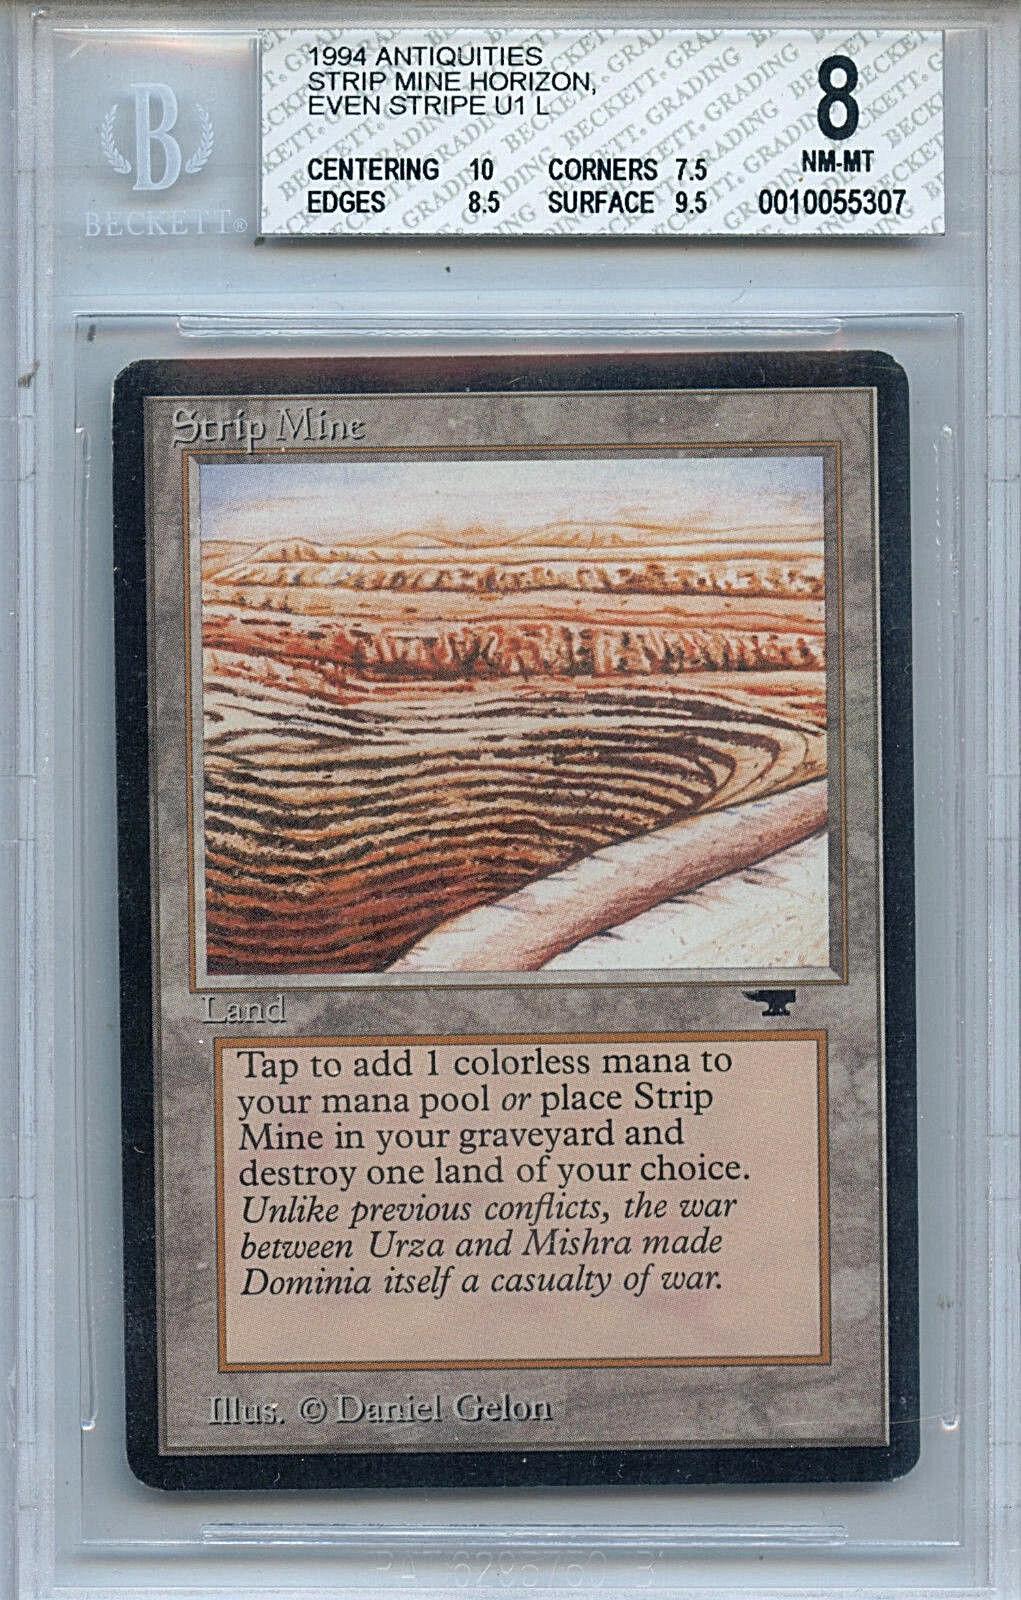 MTG Antiquities Strip Mine Even Horizon BGS 8 (8) NM-MT 10 centering 5307